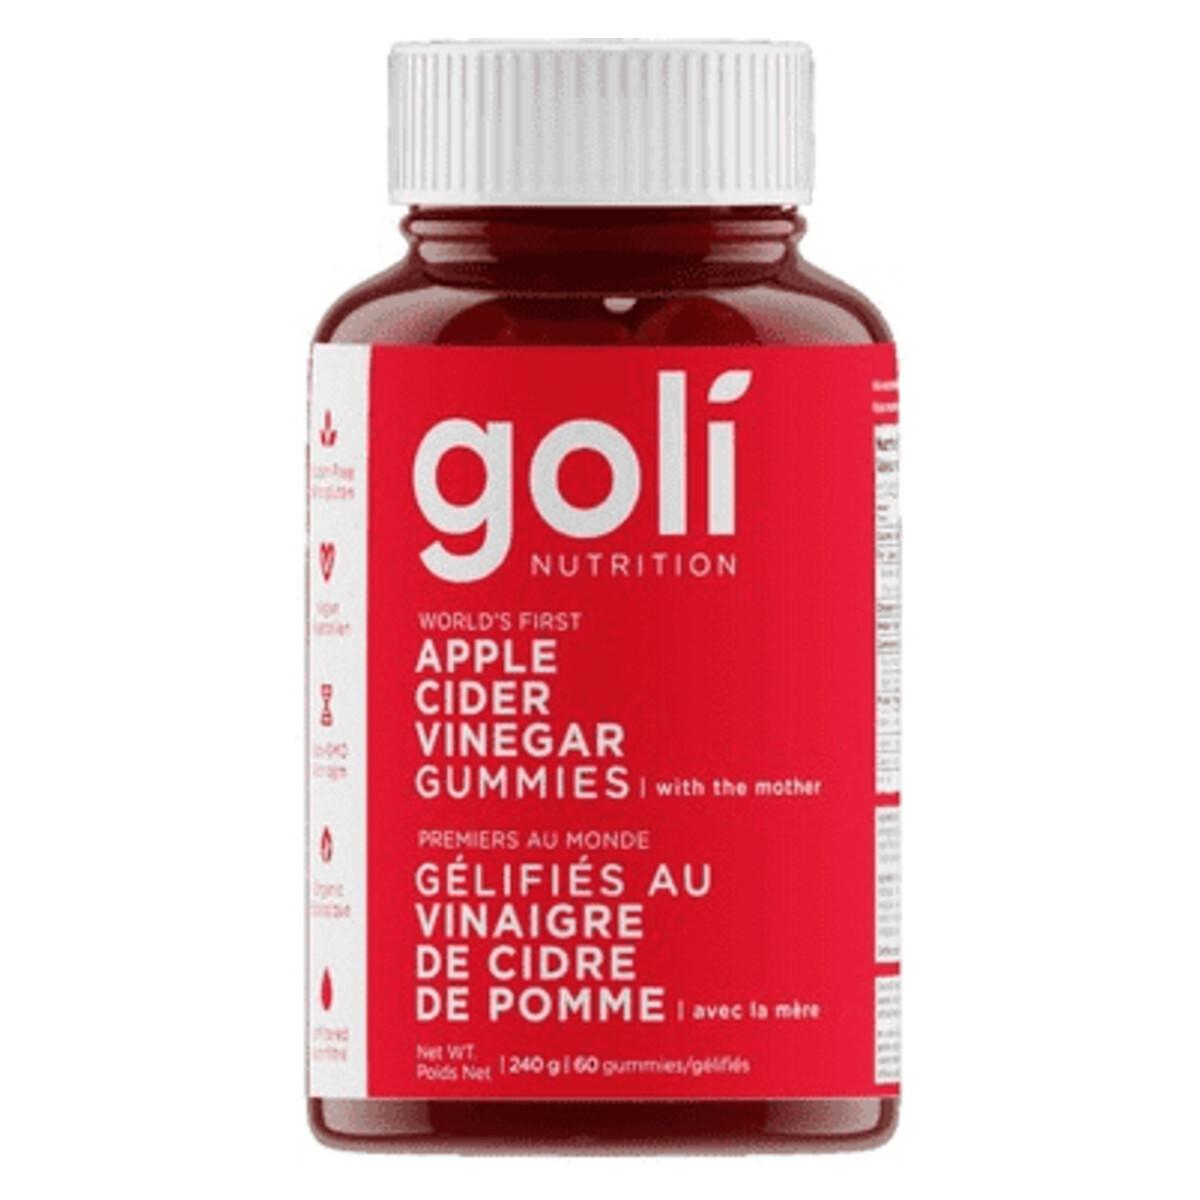 Goli Apple Cider Vinegar Gummies – ShopAlive.ca